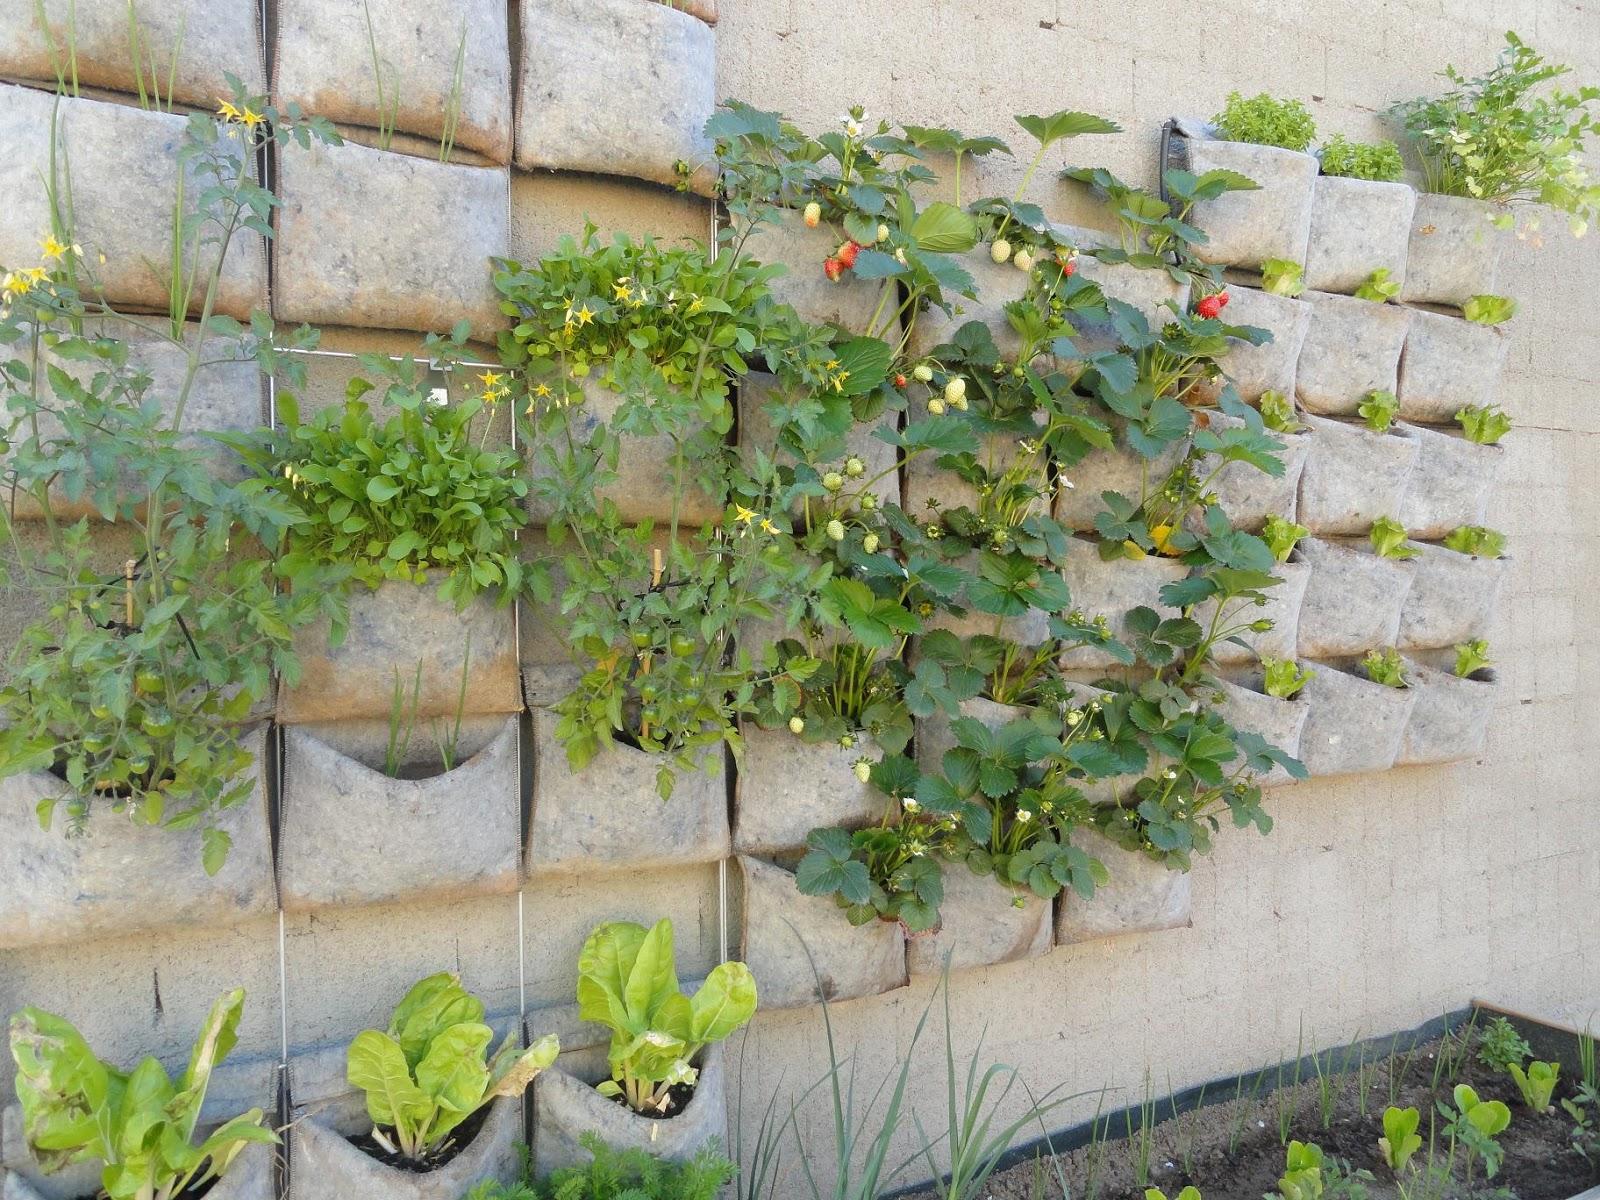 fotos de jardins urbanos : fotos de jardins urbanos:Huerto urbano vertical